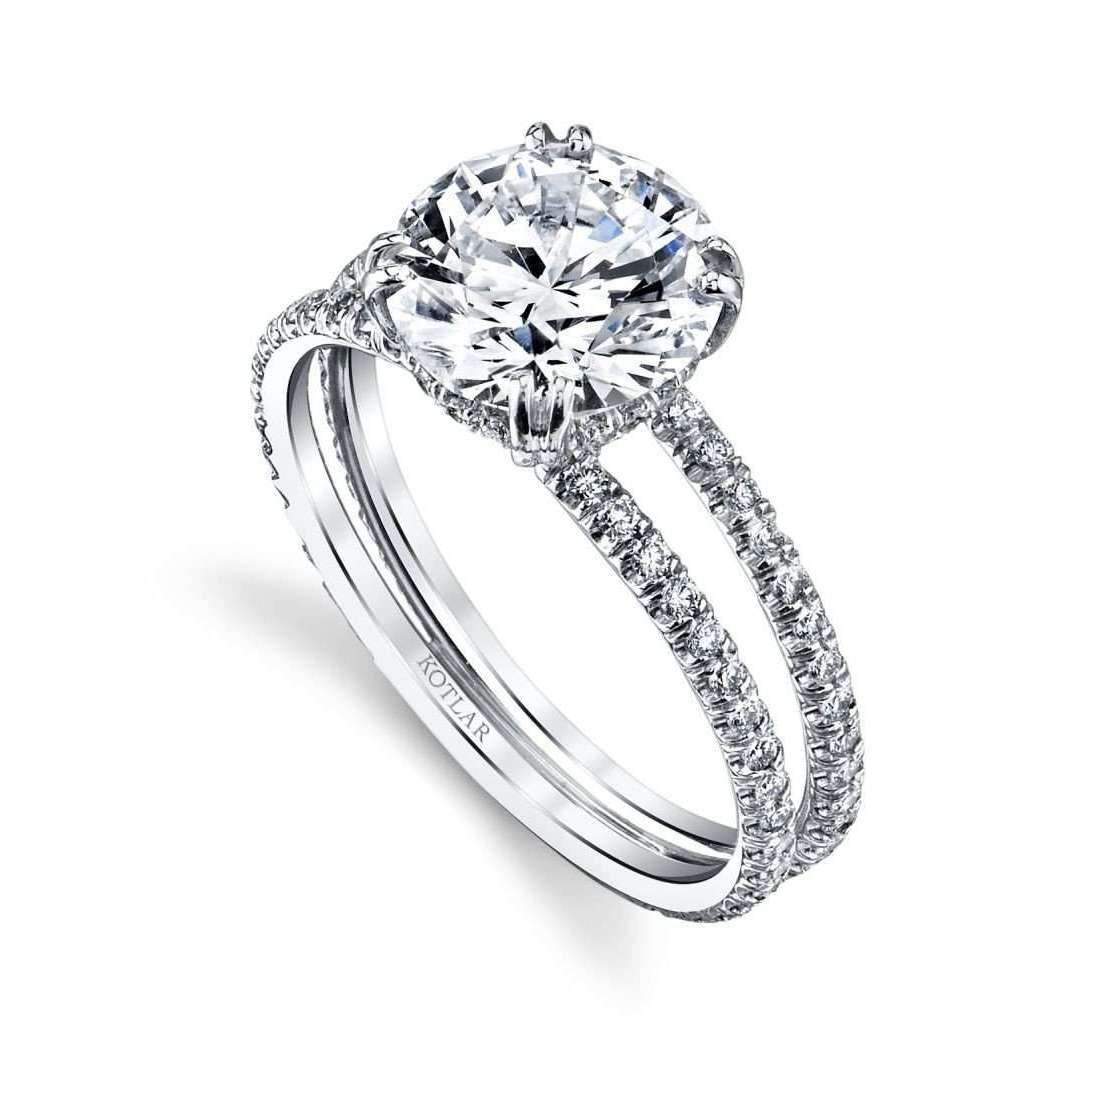 Harry Kotlar Emerald Cut Arabesque Ring - UK M - US 6 - EU 52 3/4 lRXy1